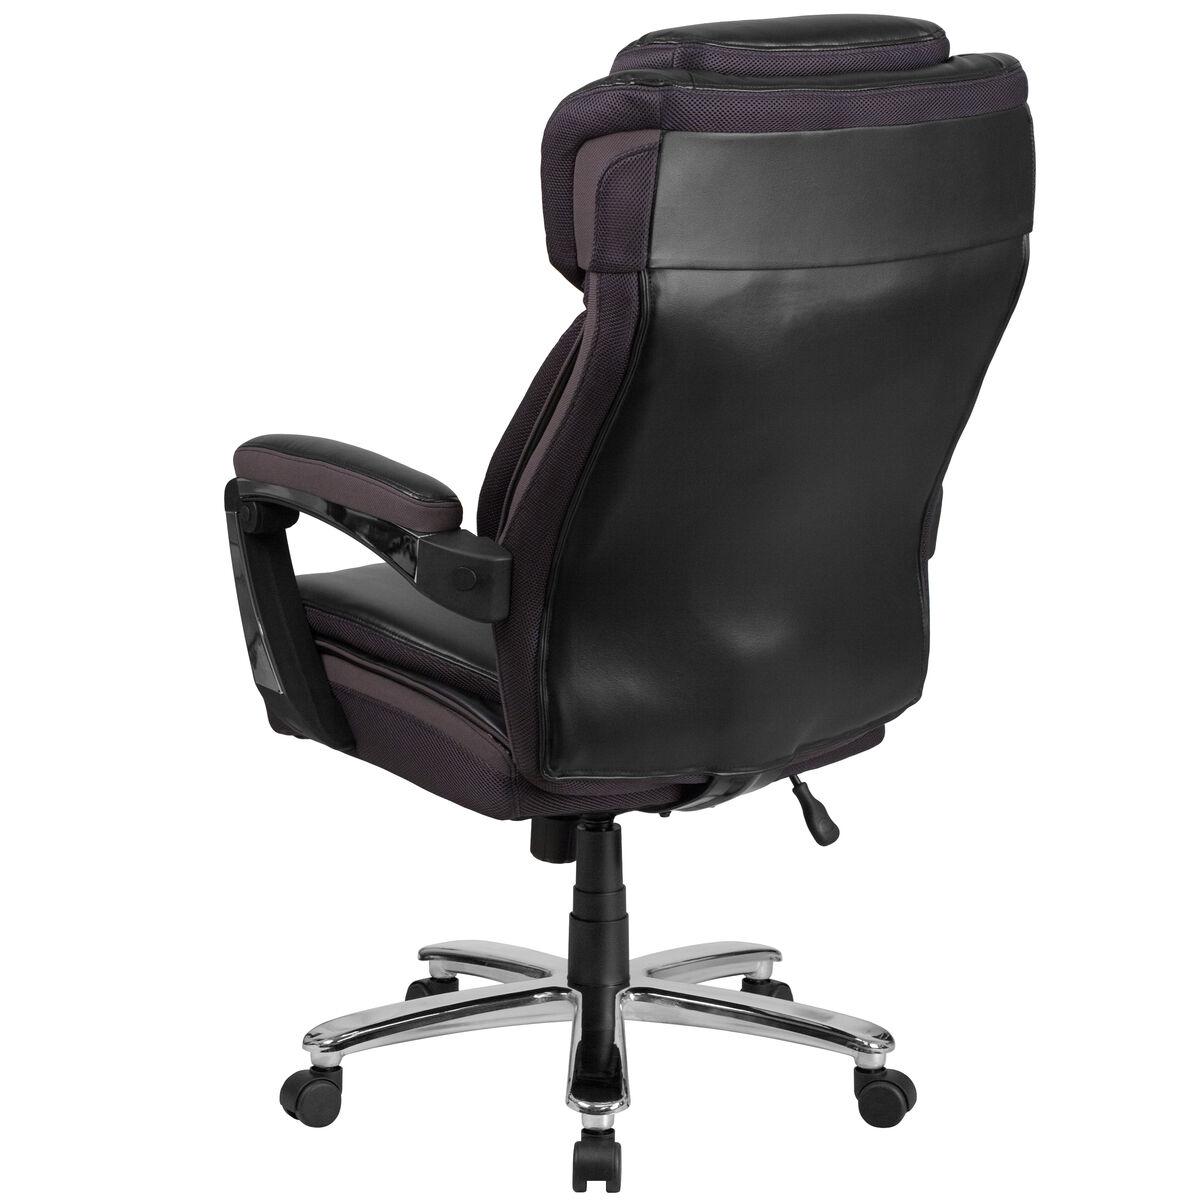 black 500lb high back chair go 2223 bk gg restaurantfurniture4less com